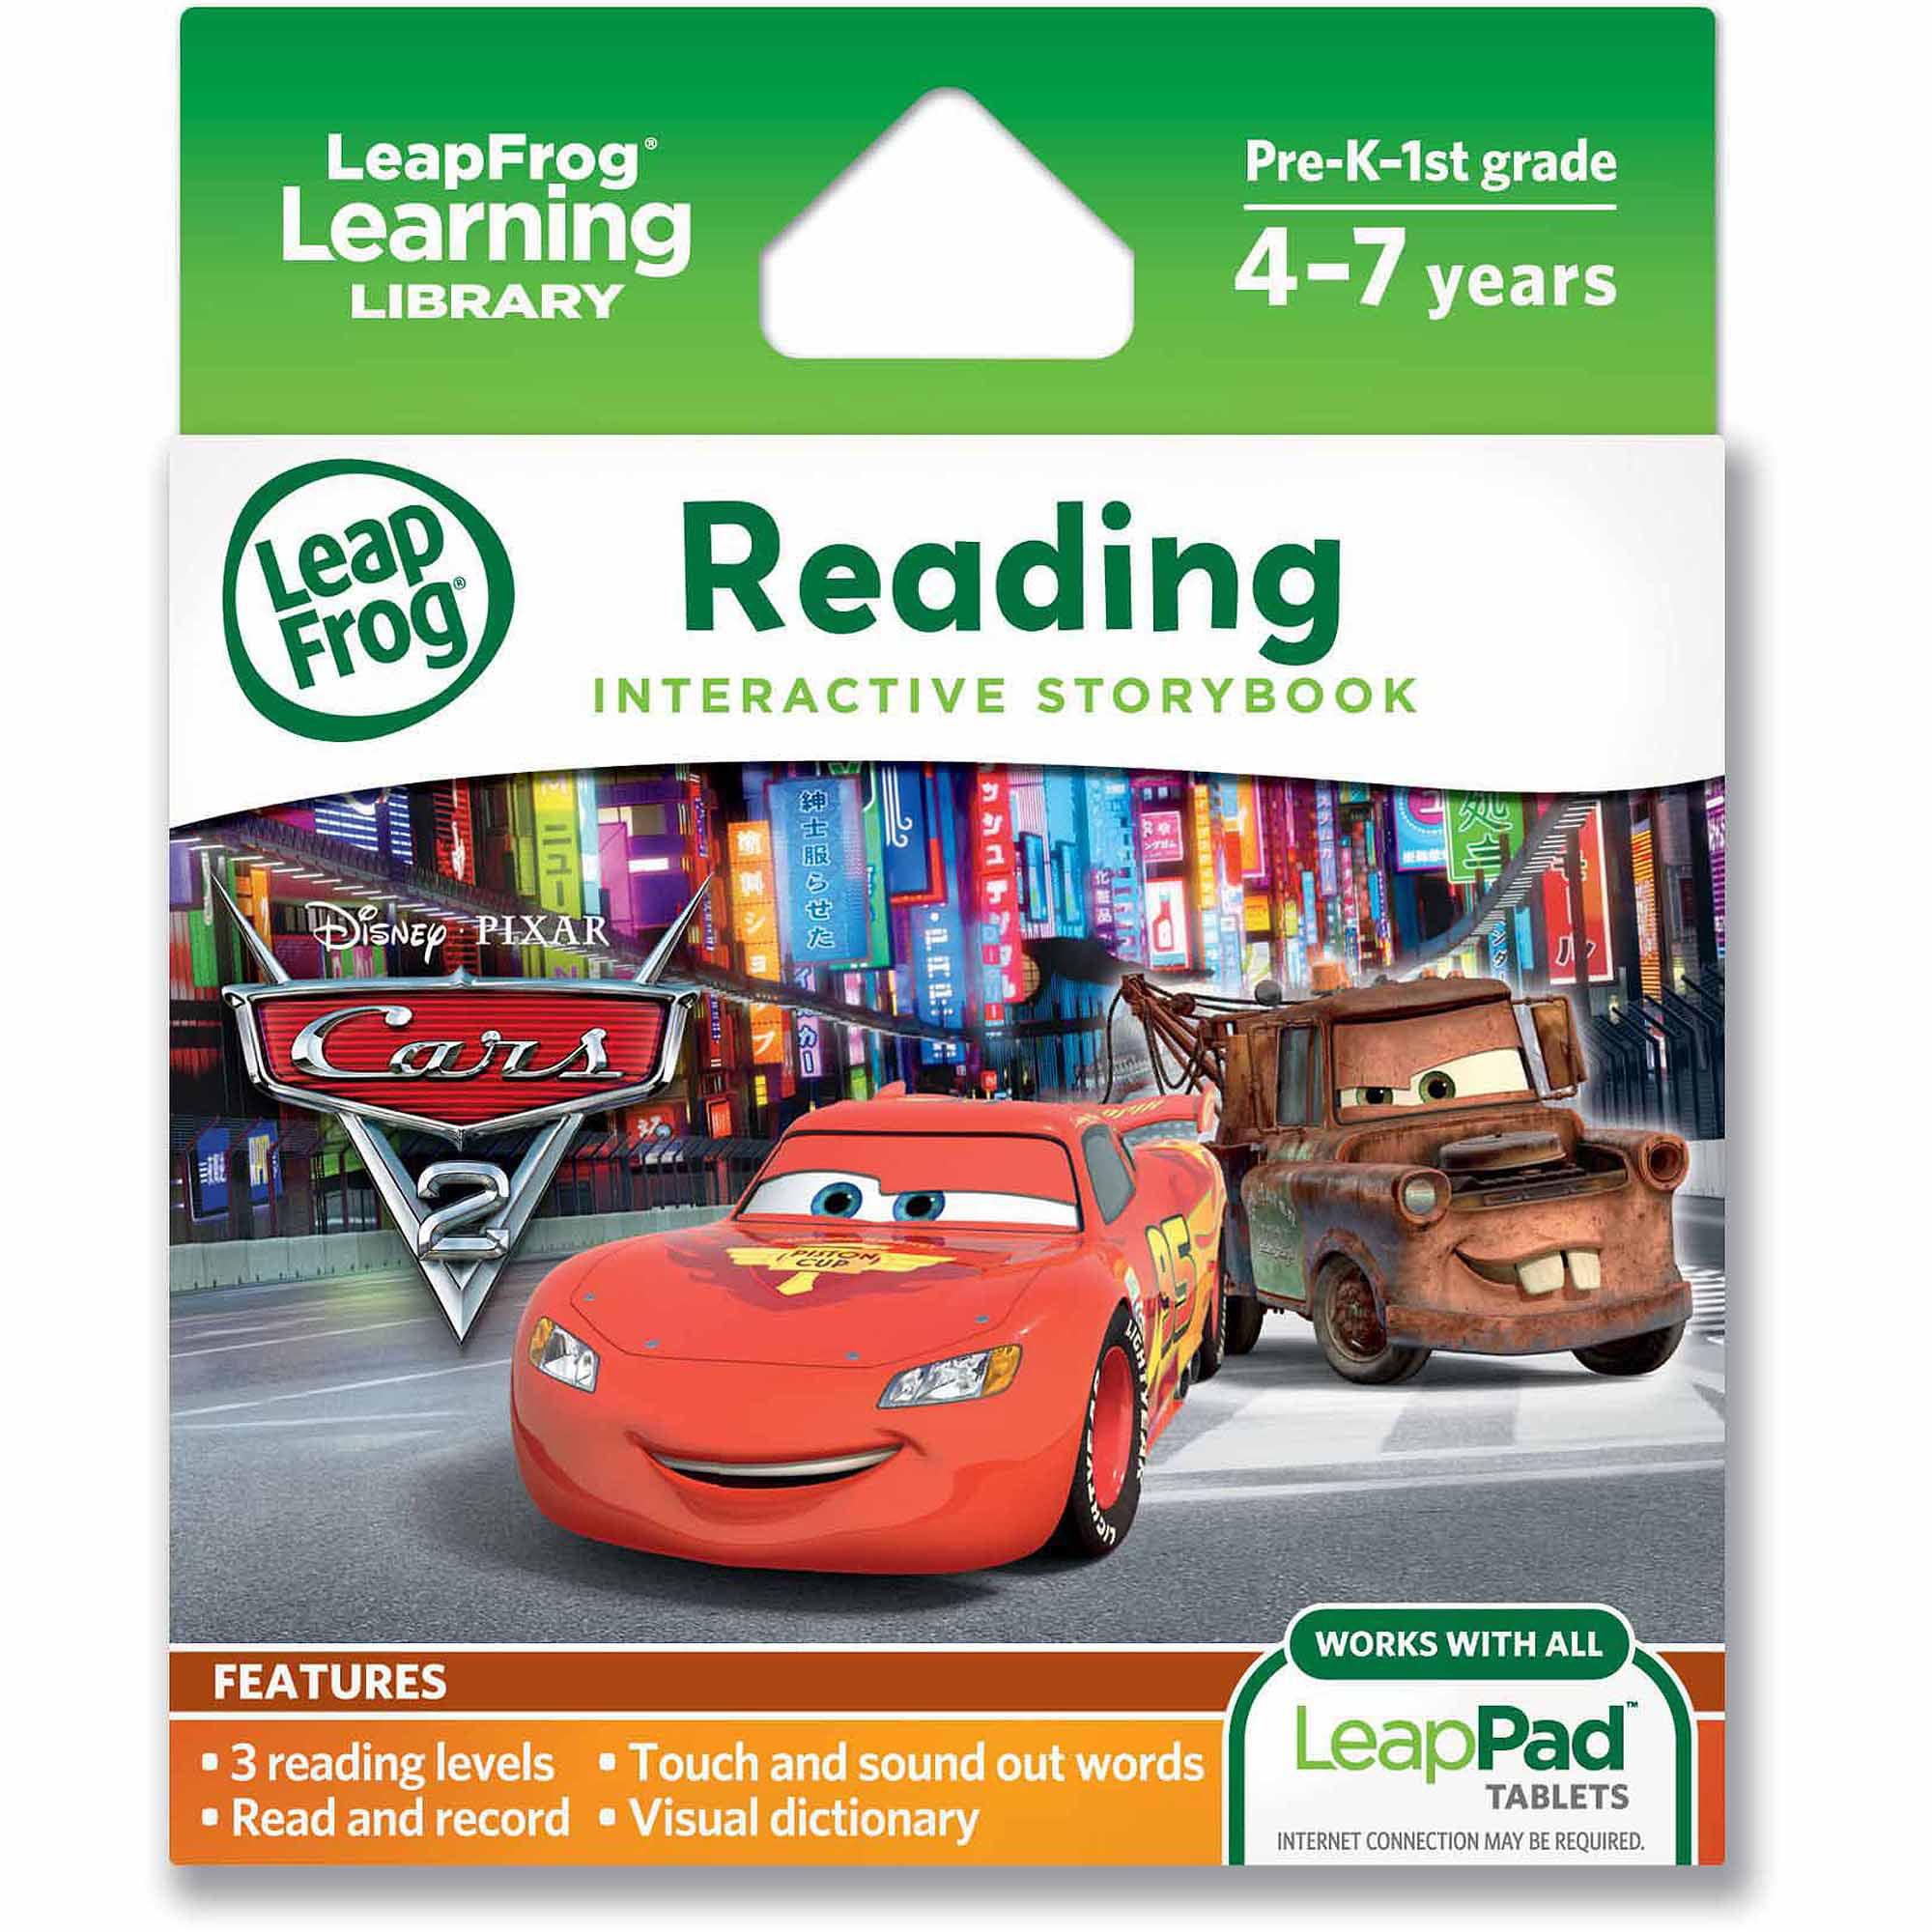 LeapFrog LeapPad Ultra eBook: Disney Pixar Cars 2 by LeapFrog